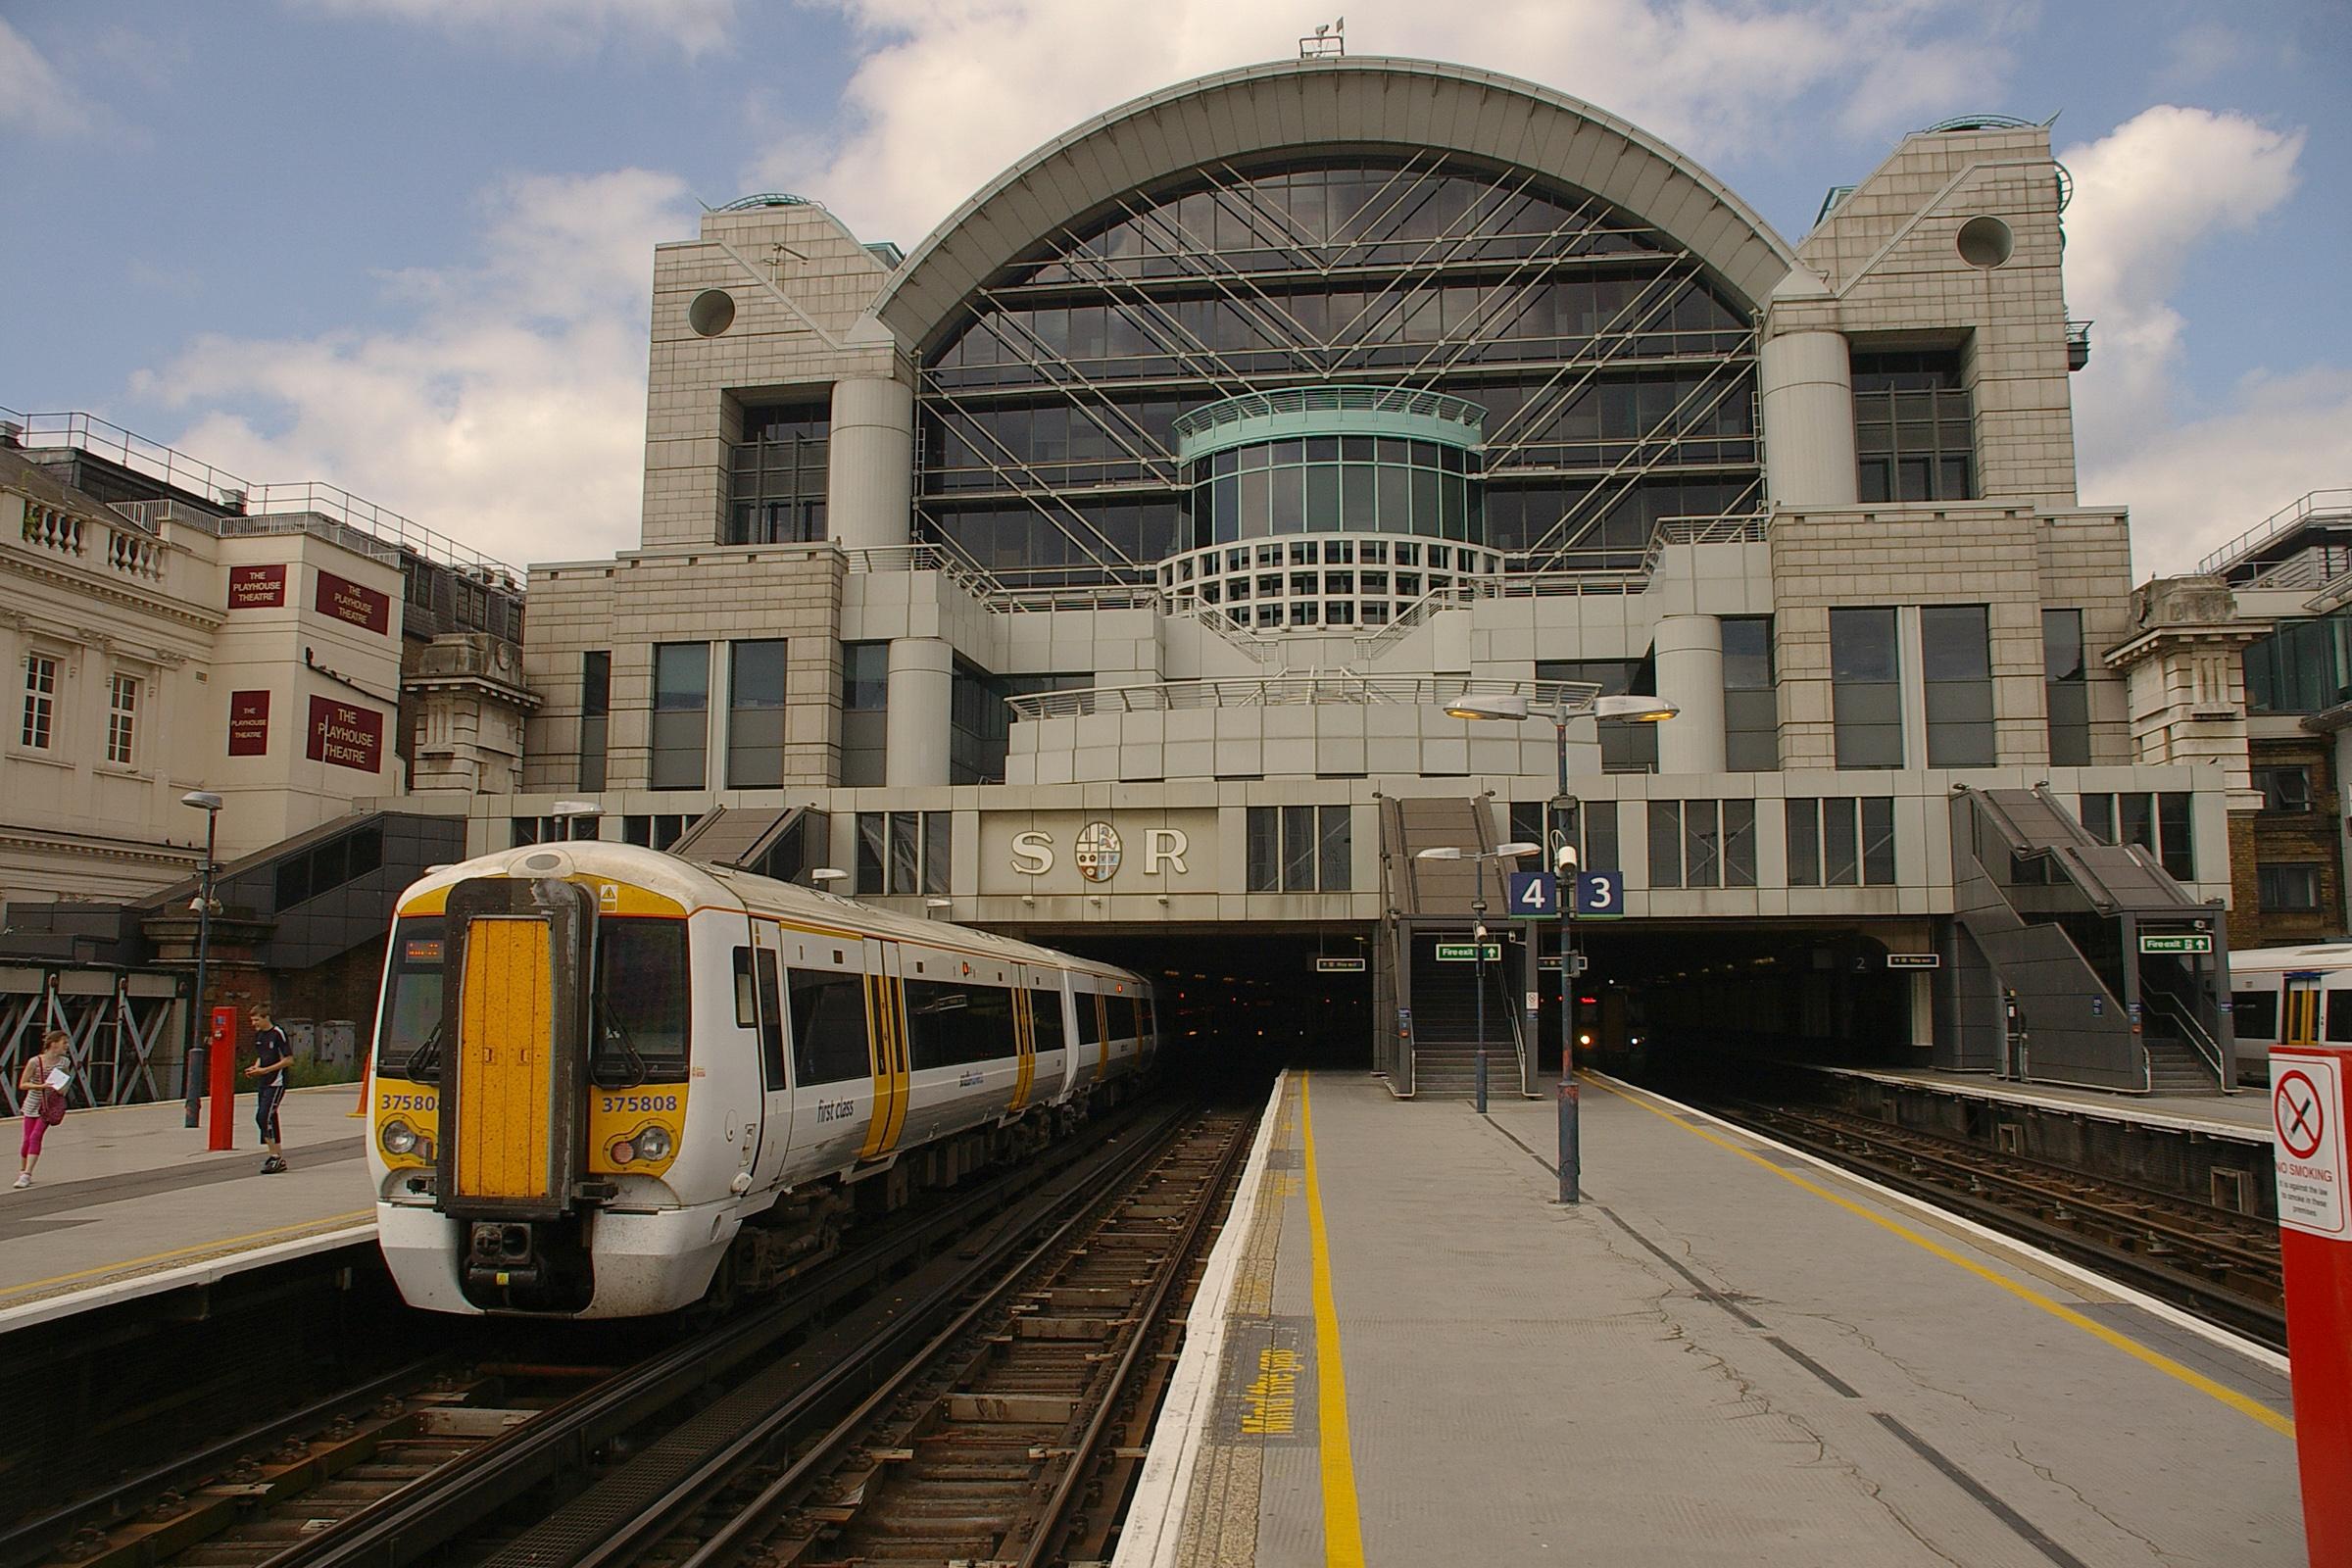 Charing_Cross_station_MMB_05_375808.jpg